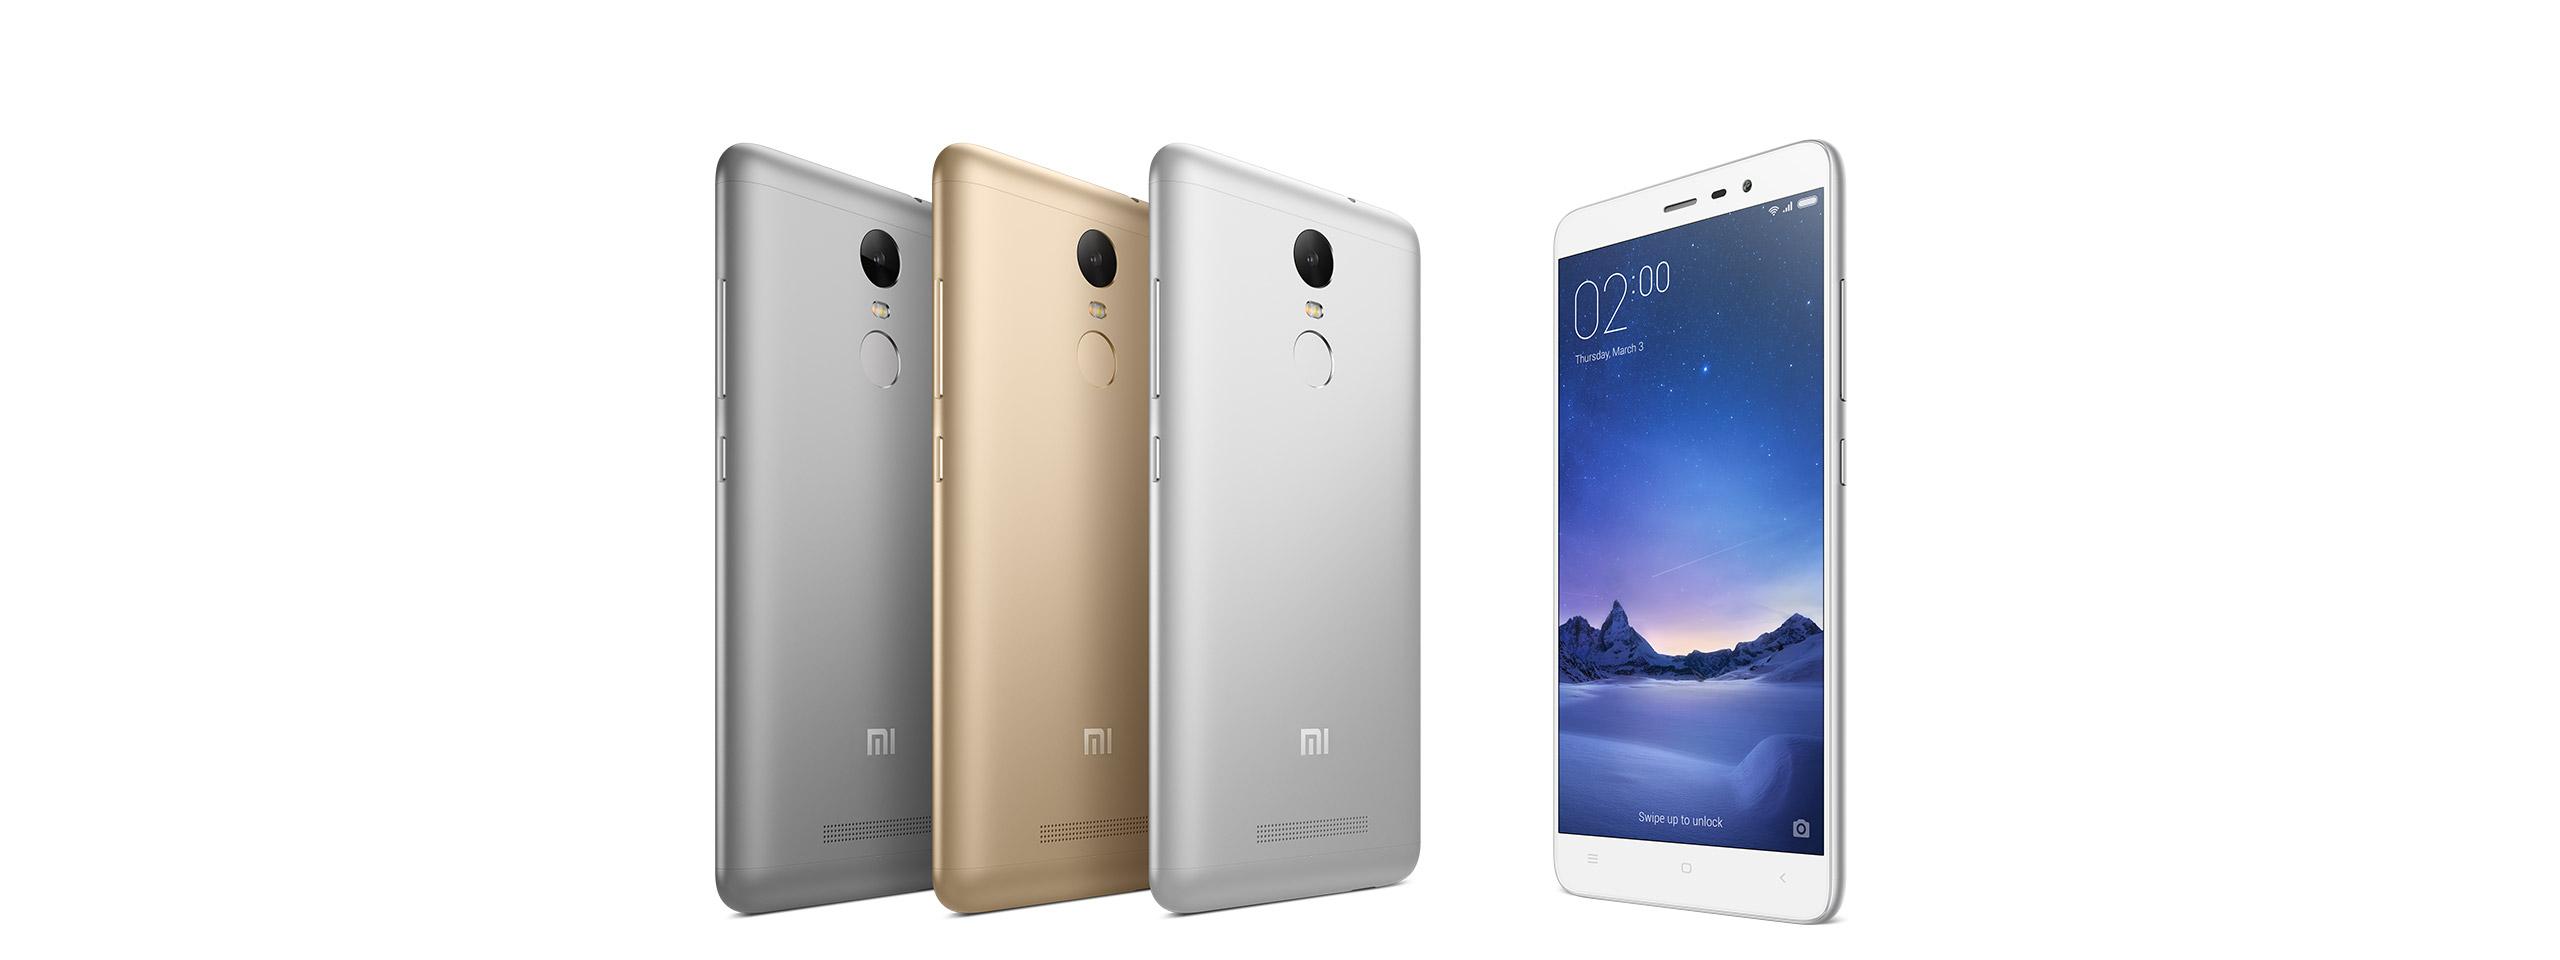 Xiaomi Redmi Note 3 Price And Features Mi India 3x Ram 2 32gb